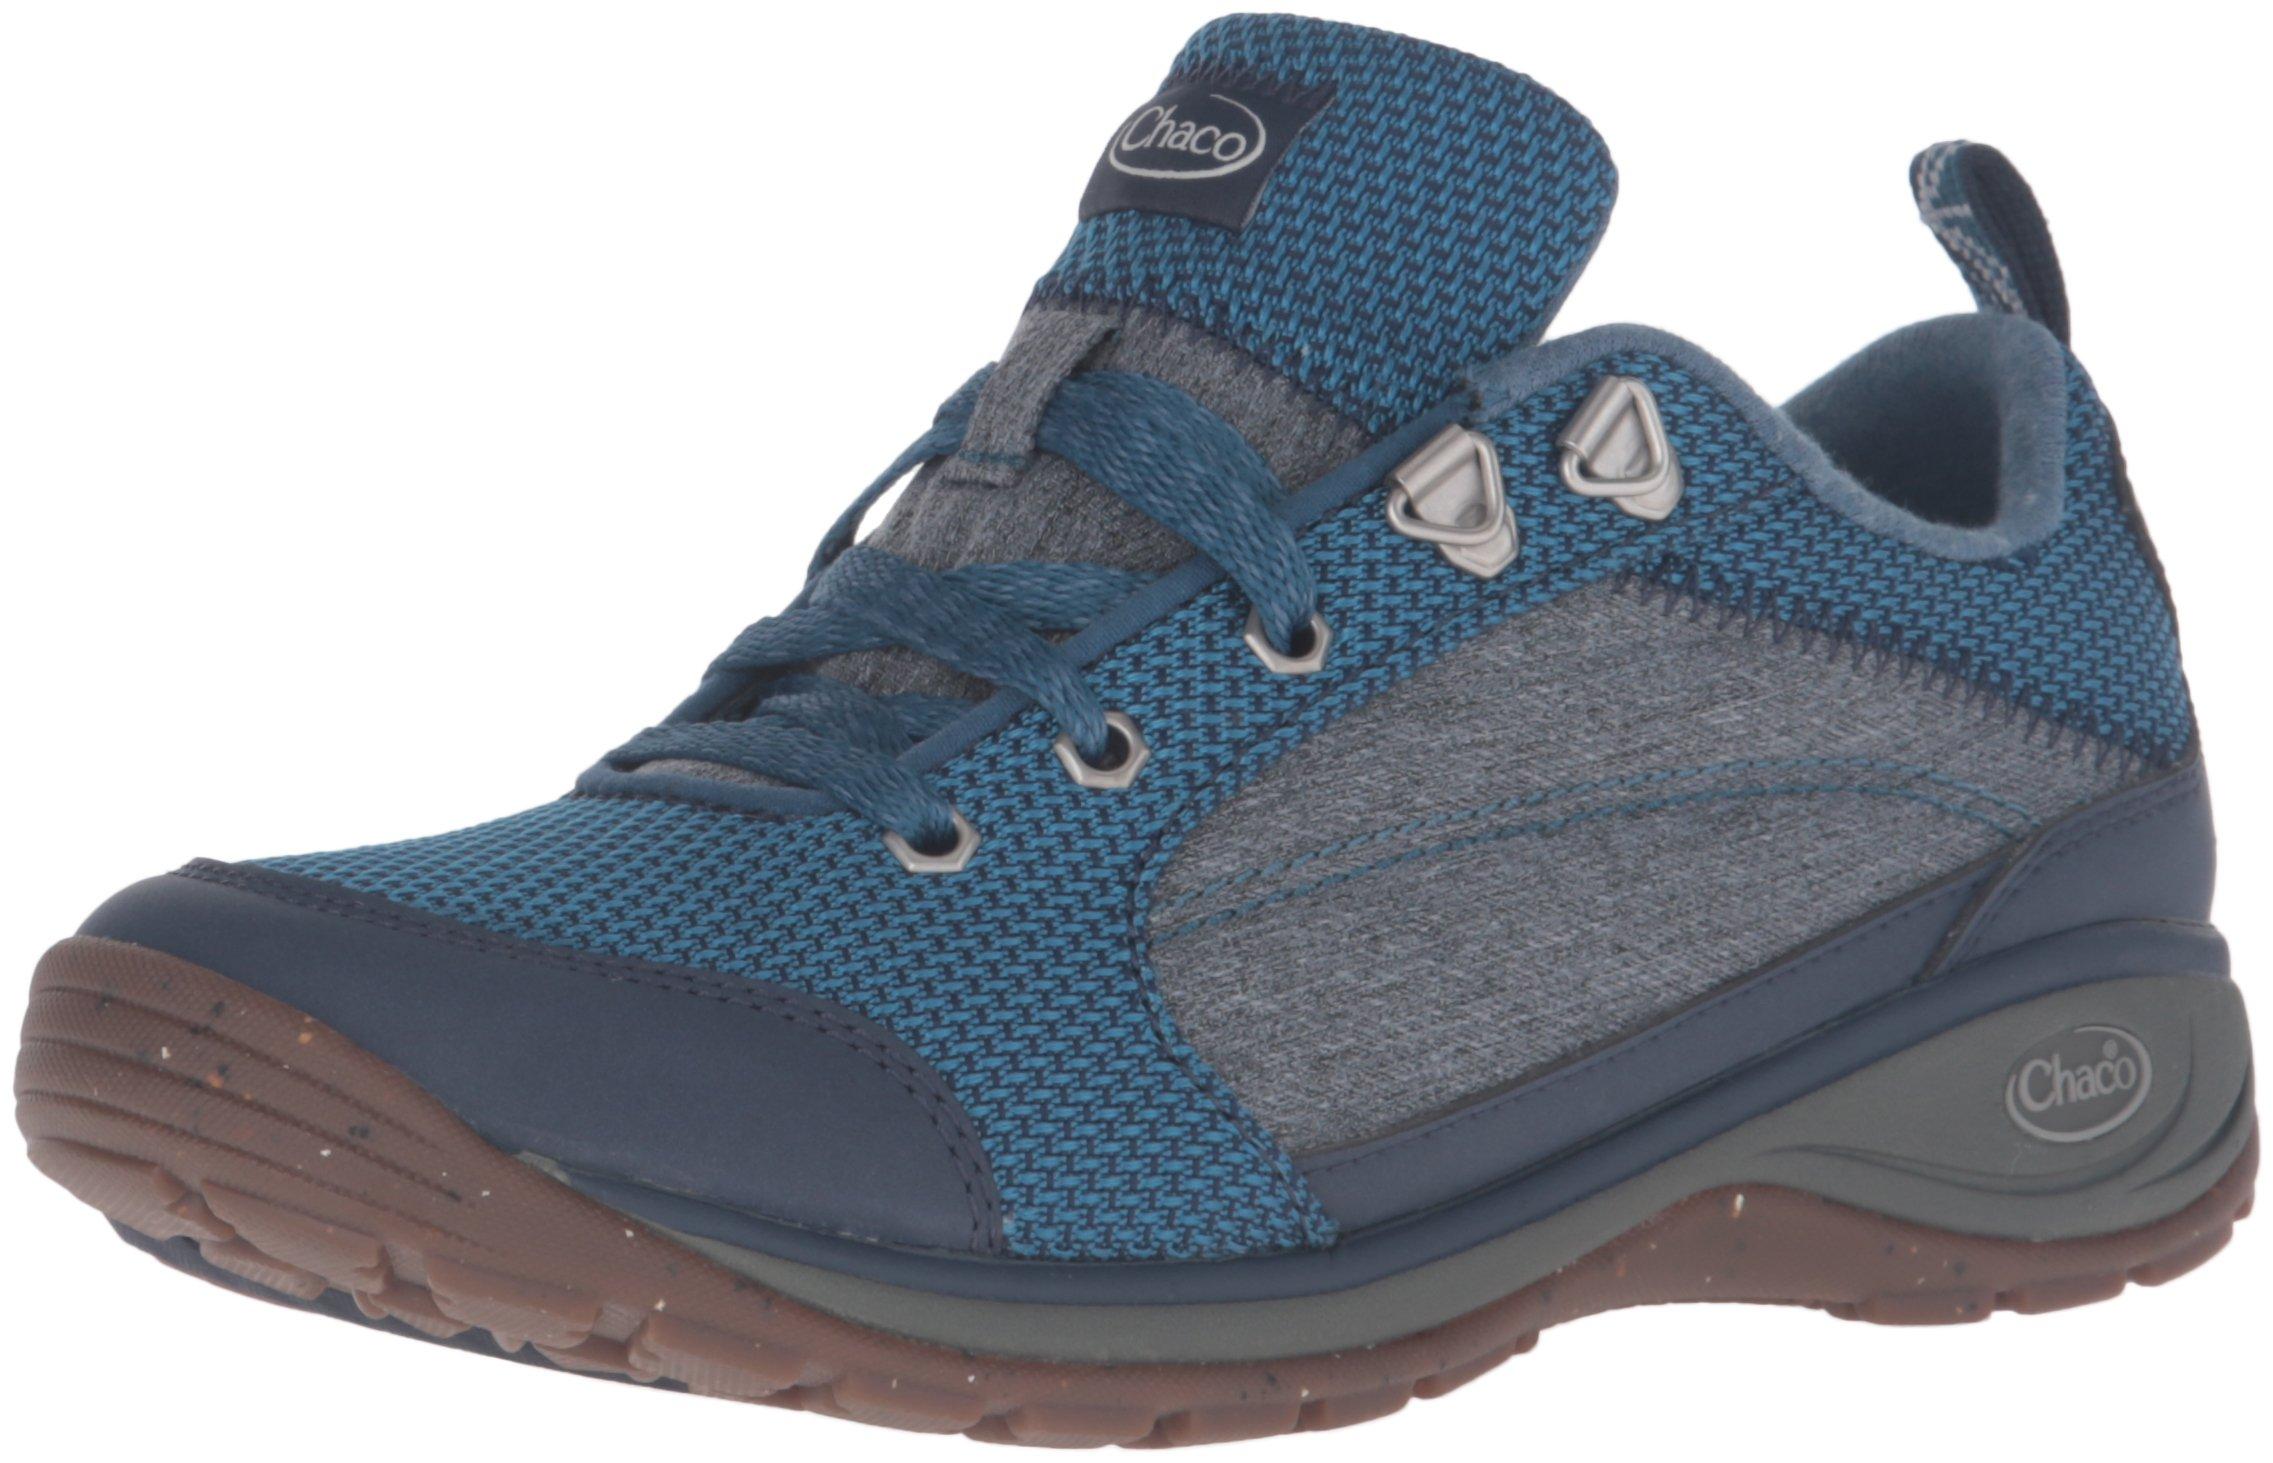 Chaco Women's Kanarra-W Hiking Shoe, Indigo, 7 M US